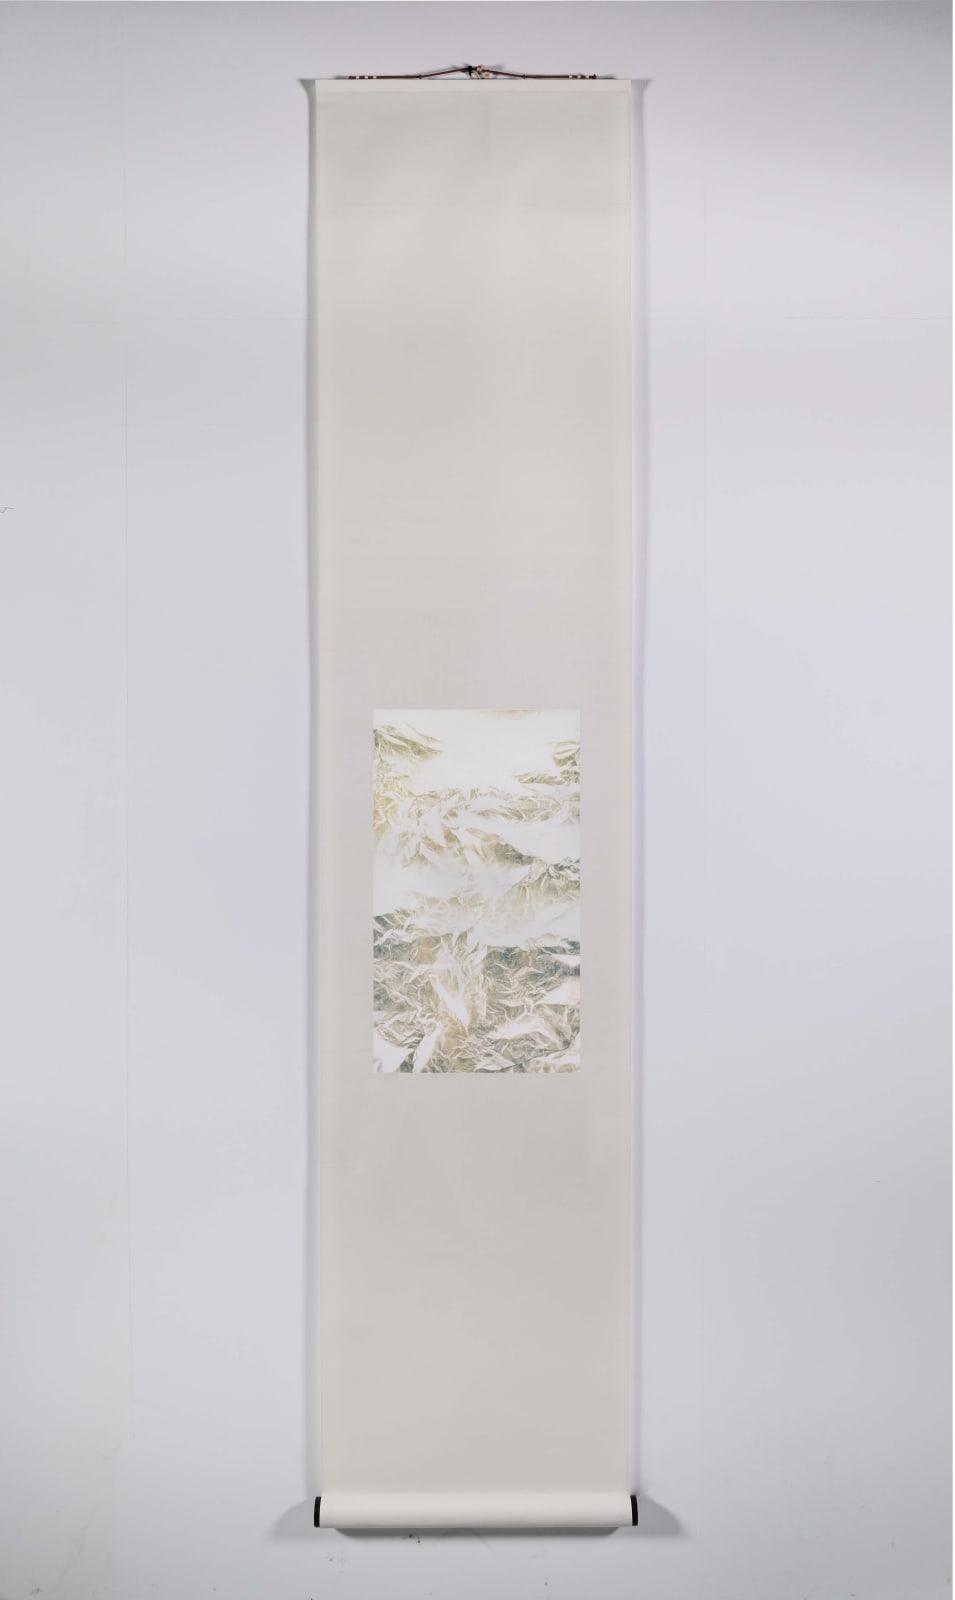 Wu Chi-Tsung 吳季璁, Wrinkled Texture 063 皴法習作之六十三, 2018